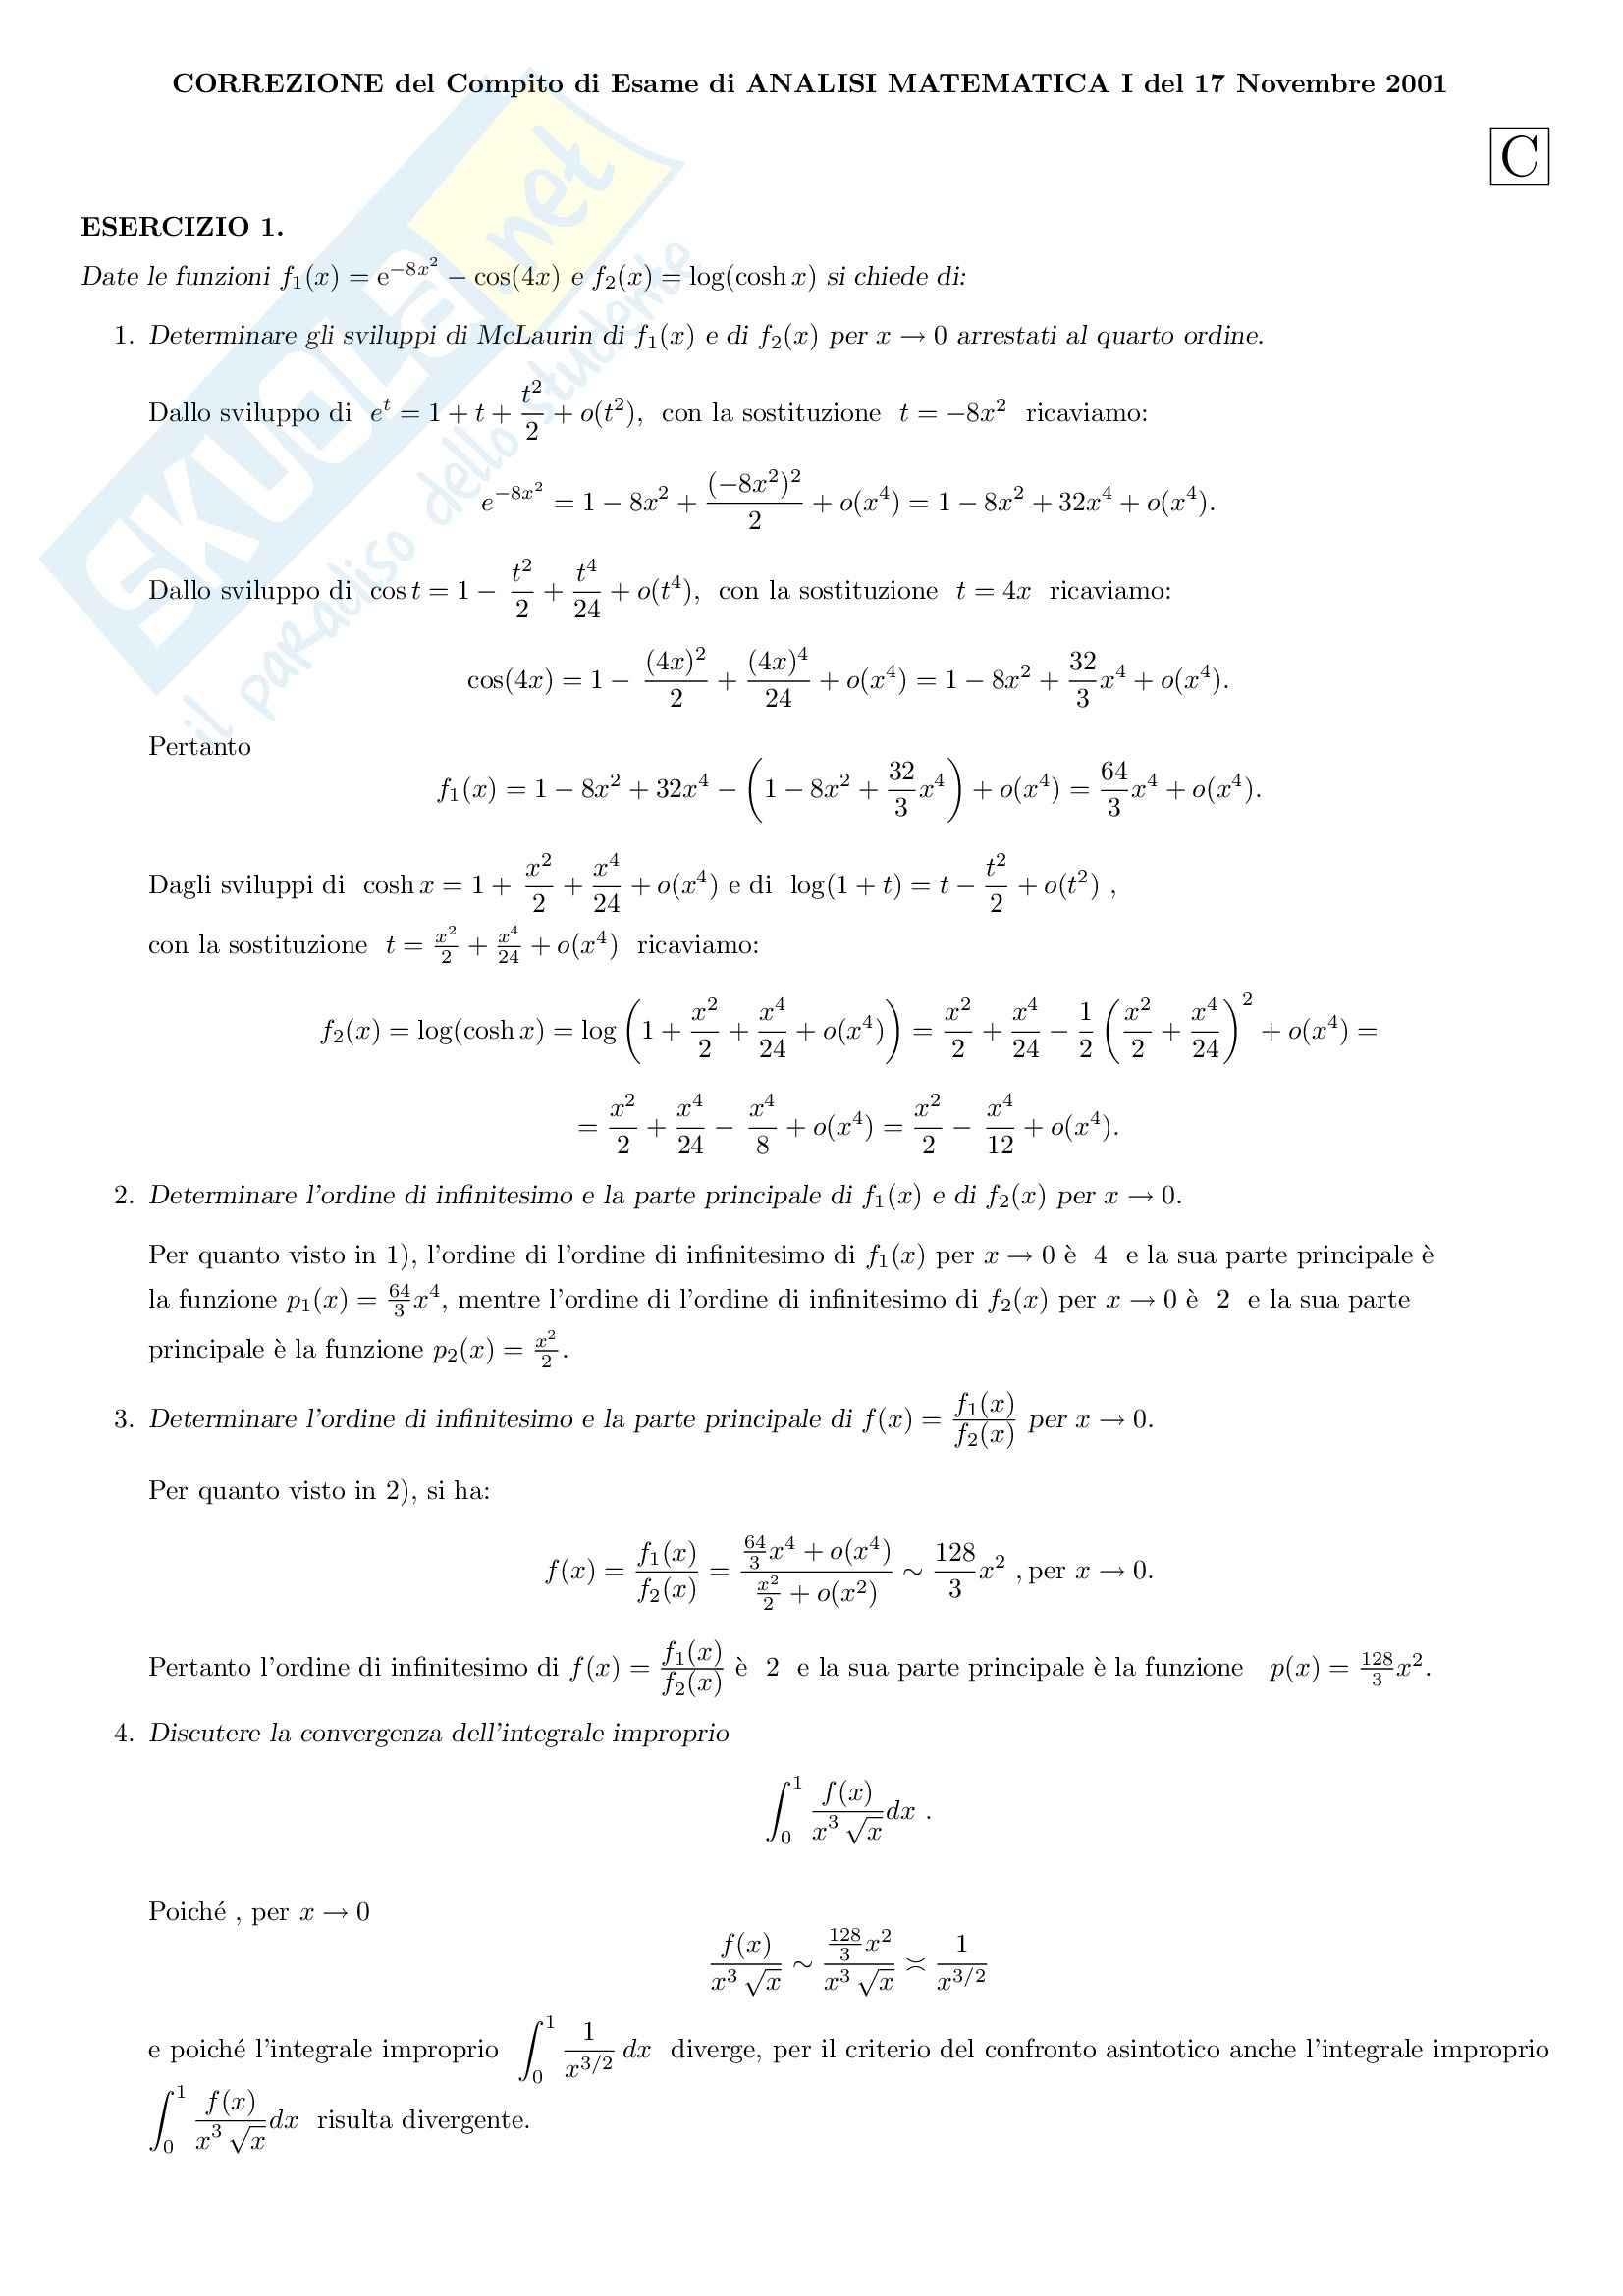 Analisi Matematica 1 - Esercizi